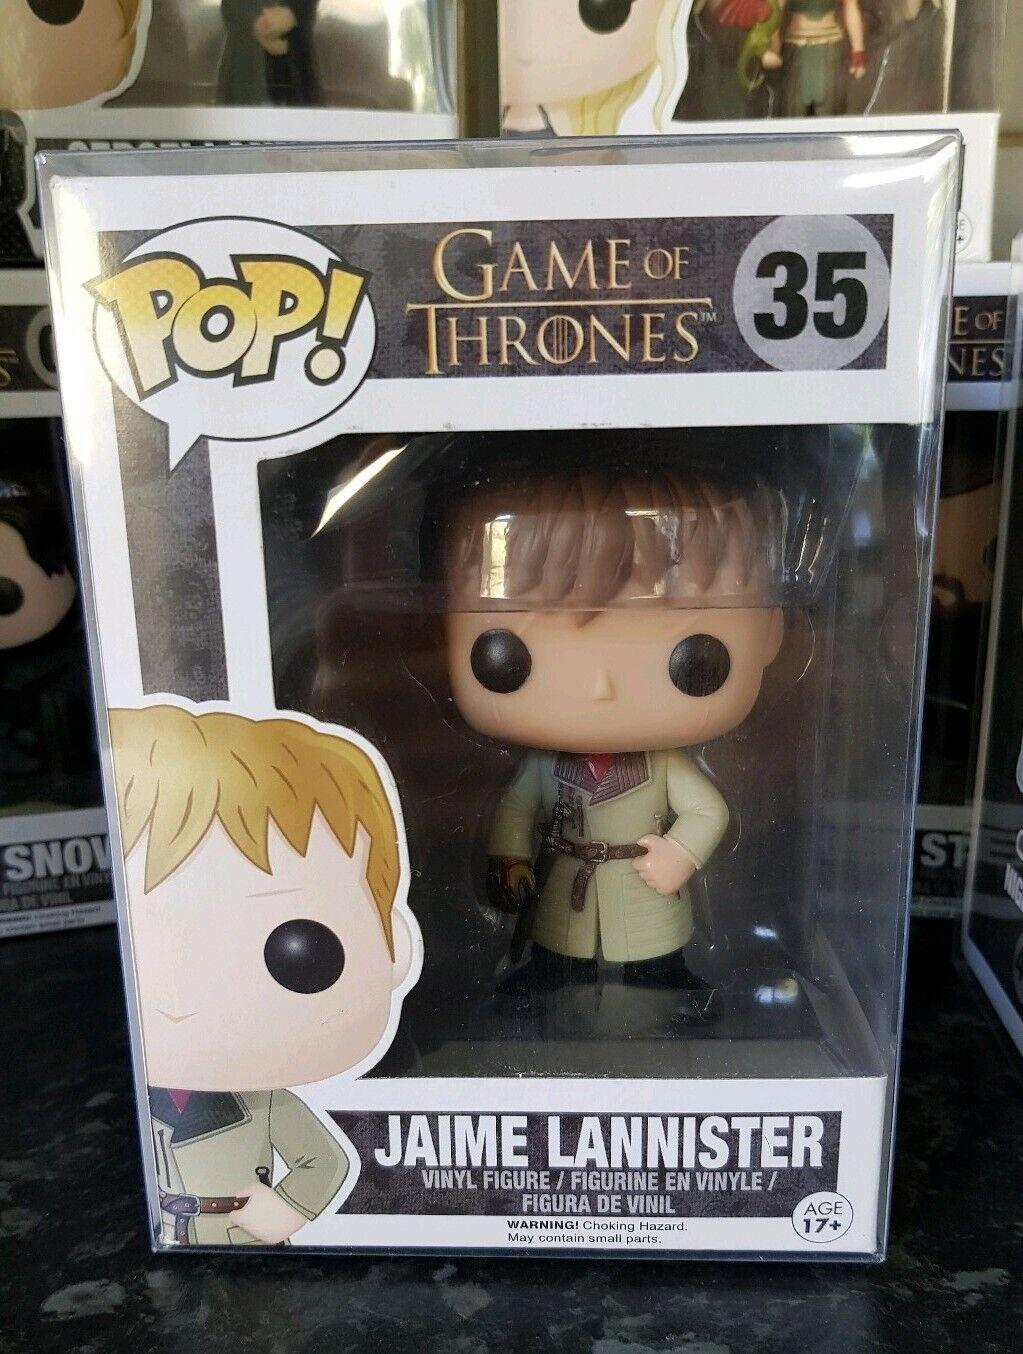 Diverdeimentoko POP Jaime Lannister oro He gioco  OF THRONES  35 presente nel Vault RARA PLUS ProssoEC  comprare sconti